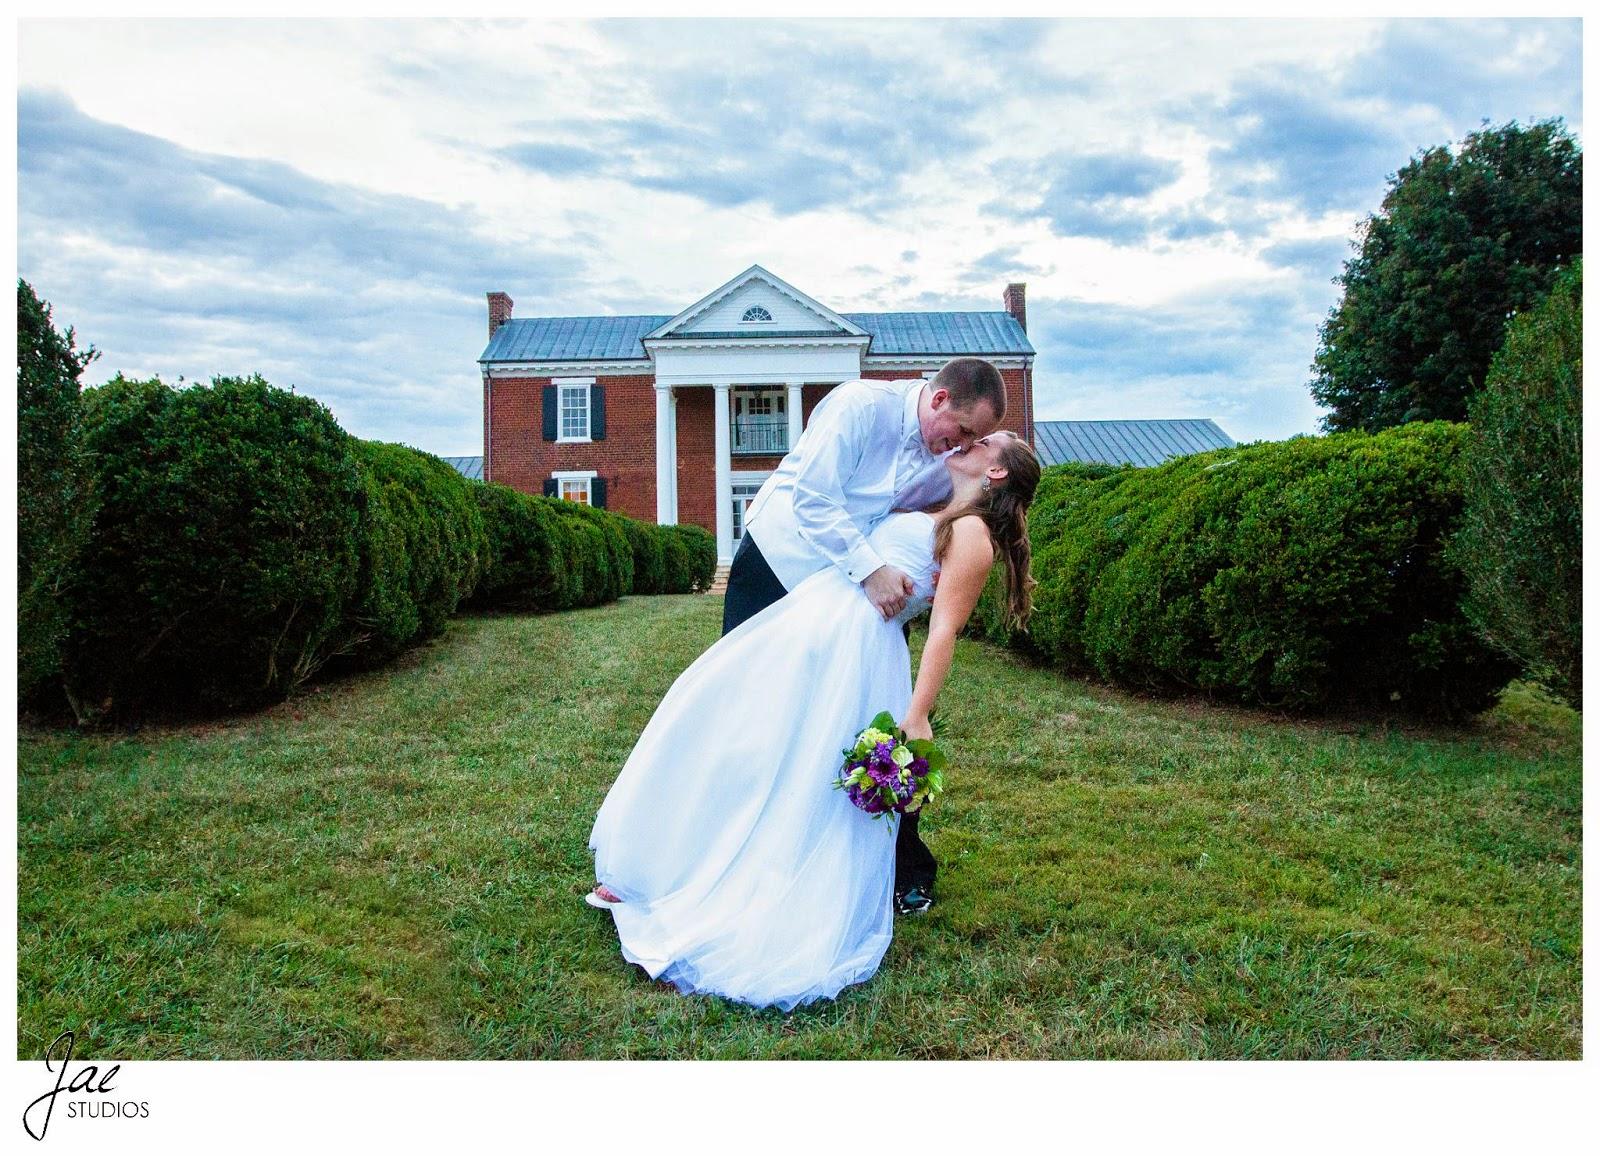 Jonathan and Julie, Bird cage, West Manor Estate, Wedding, Lynchburg, Virginia, Jae Studios, wedding dress, grass, tuxedo, flowers, purple, dipping